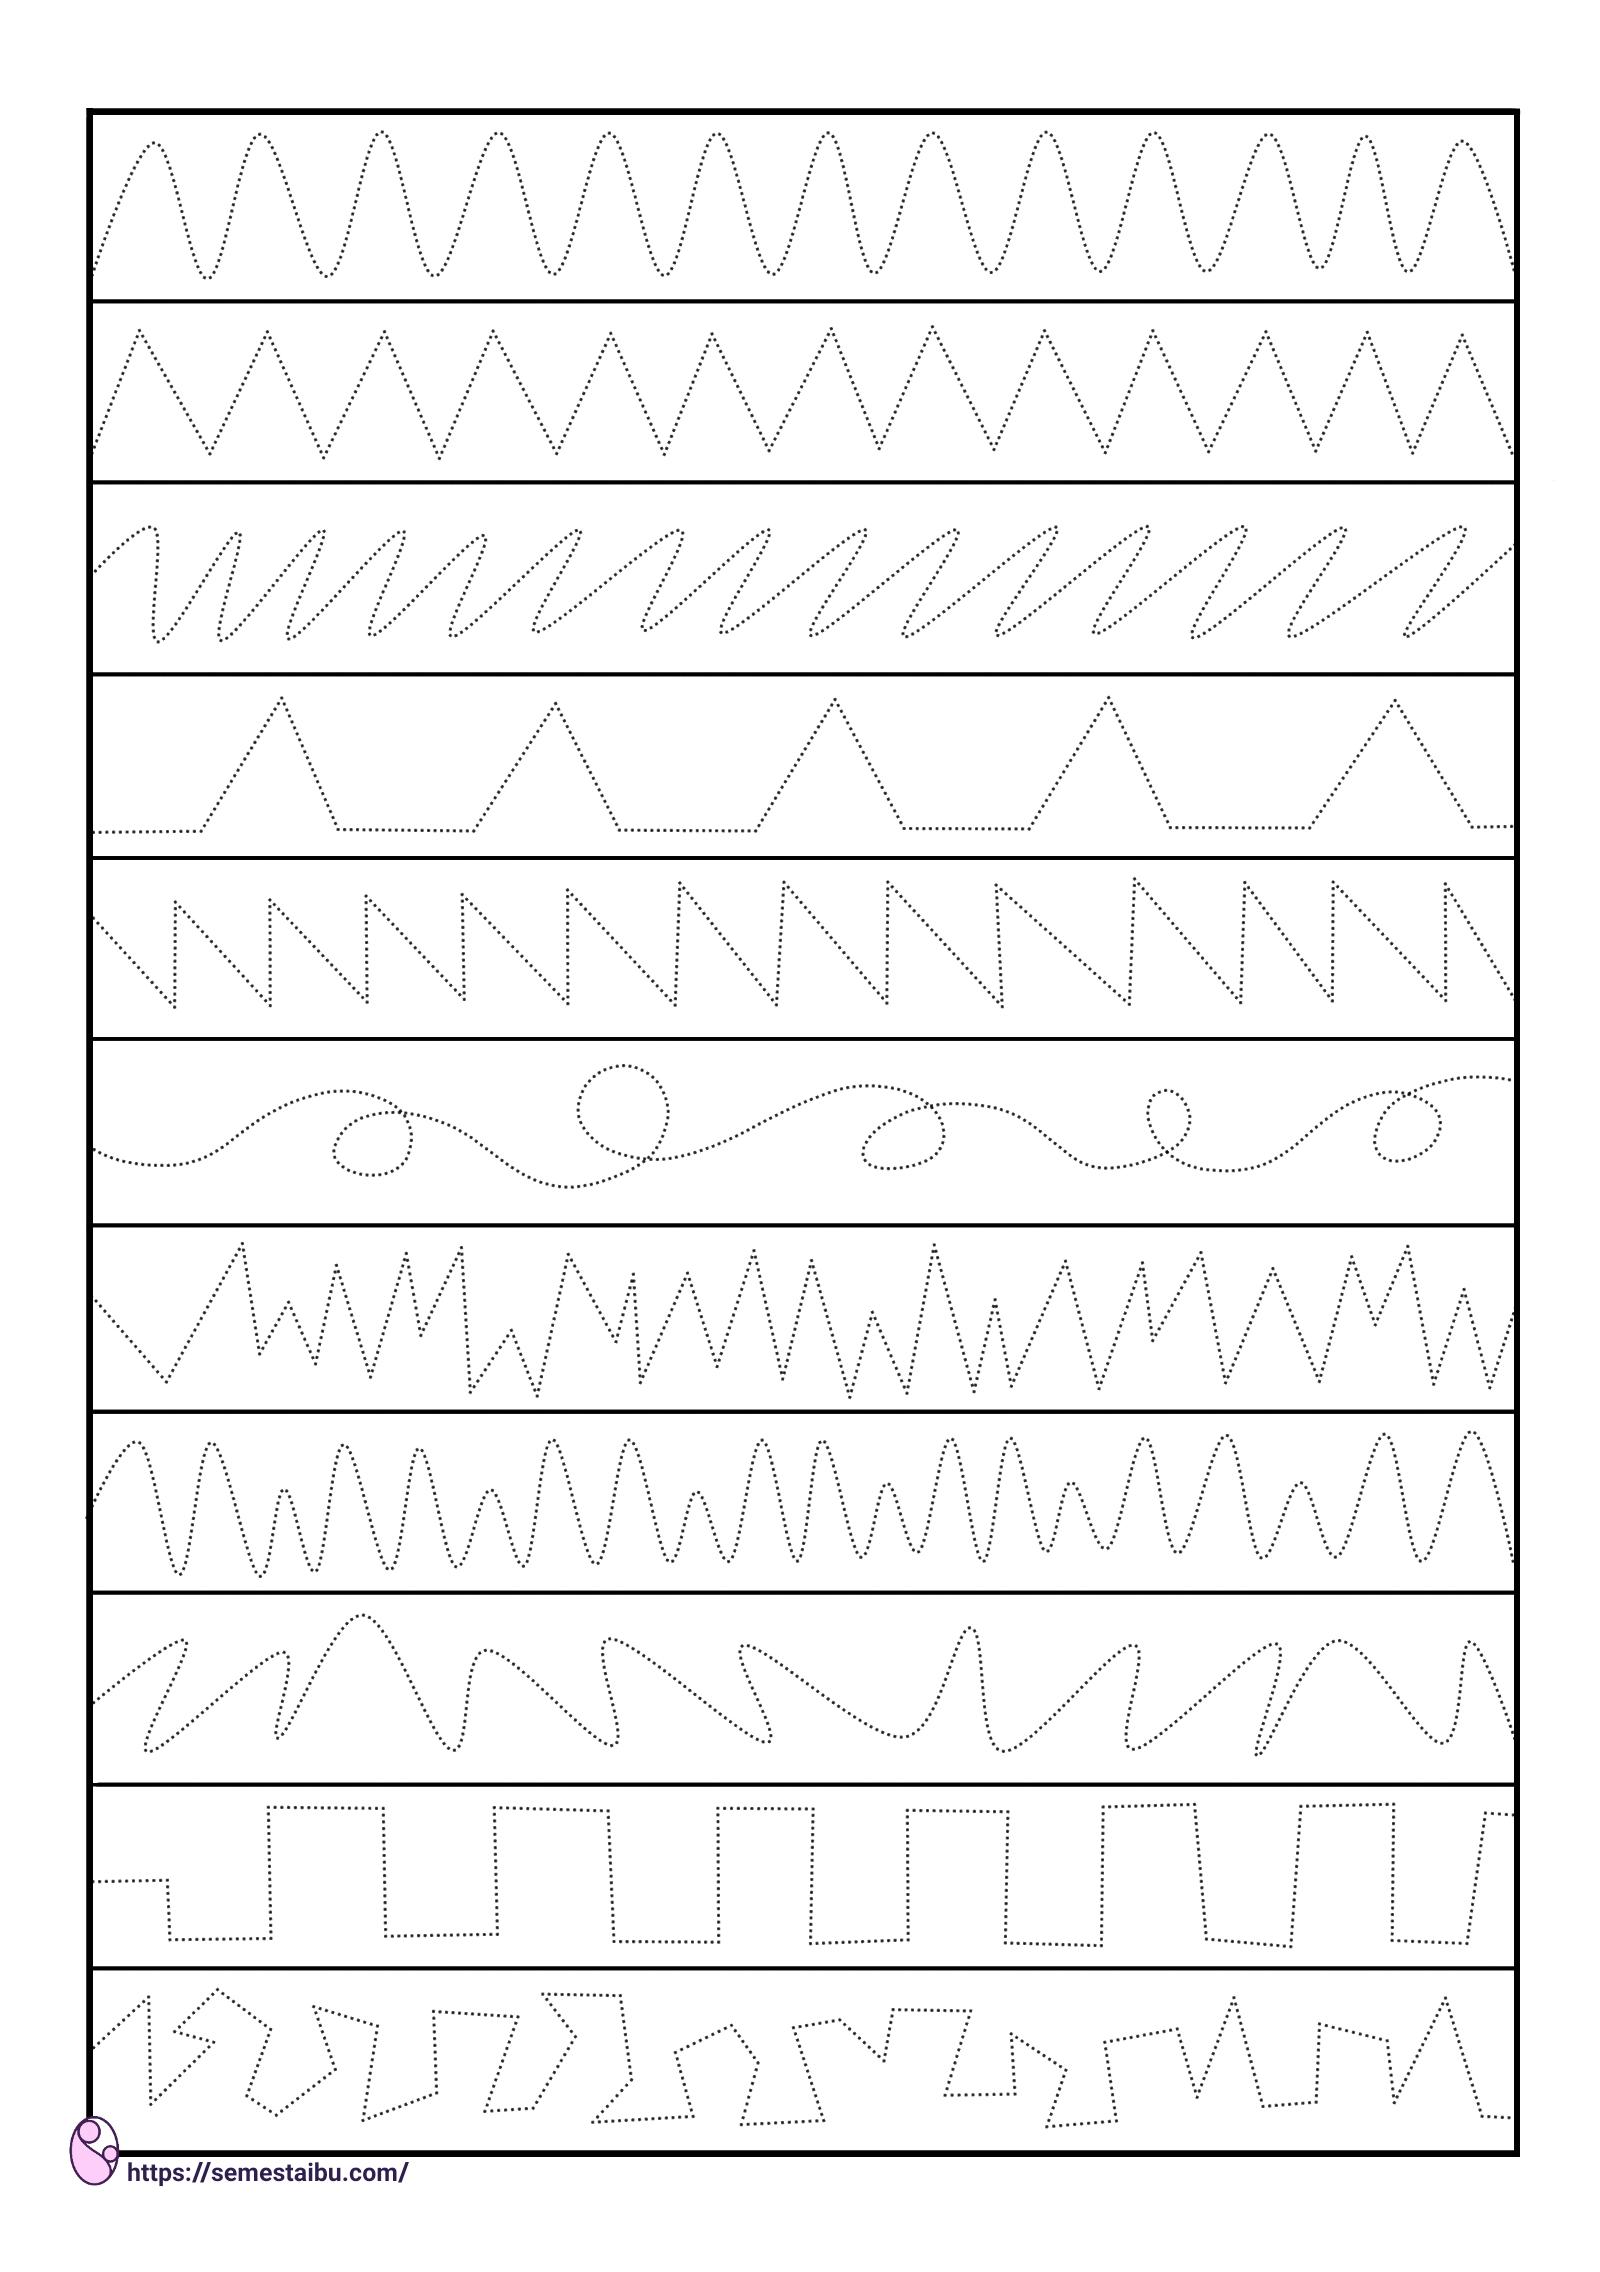 Lembar kerja anak TK PAUD - menebalkan garis